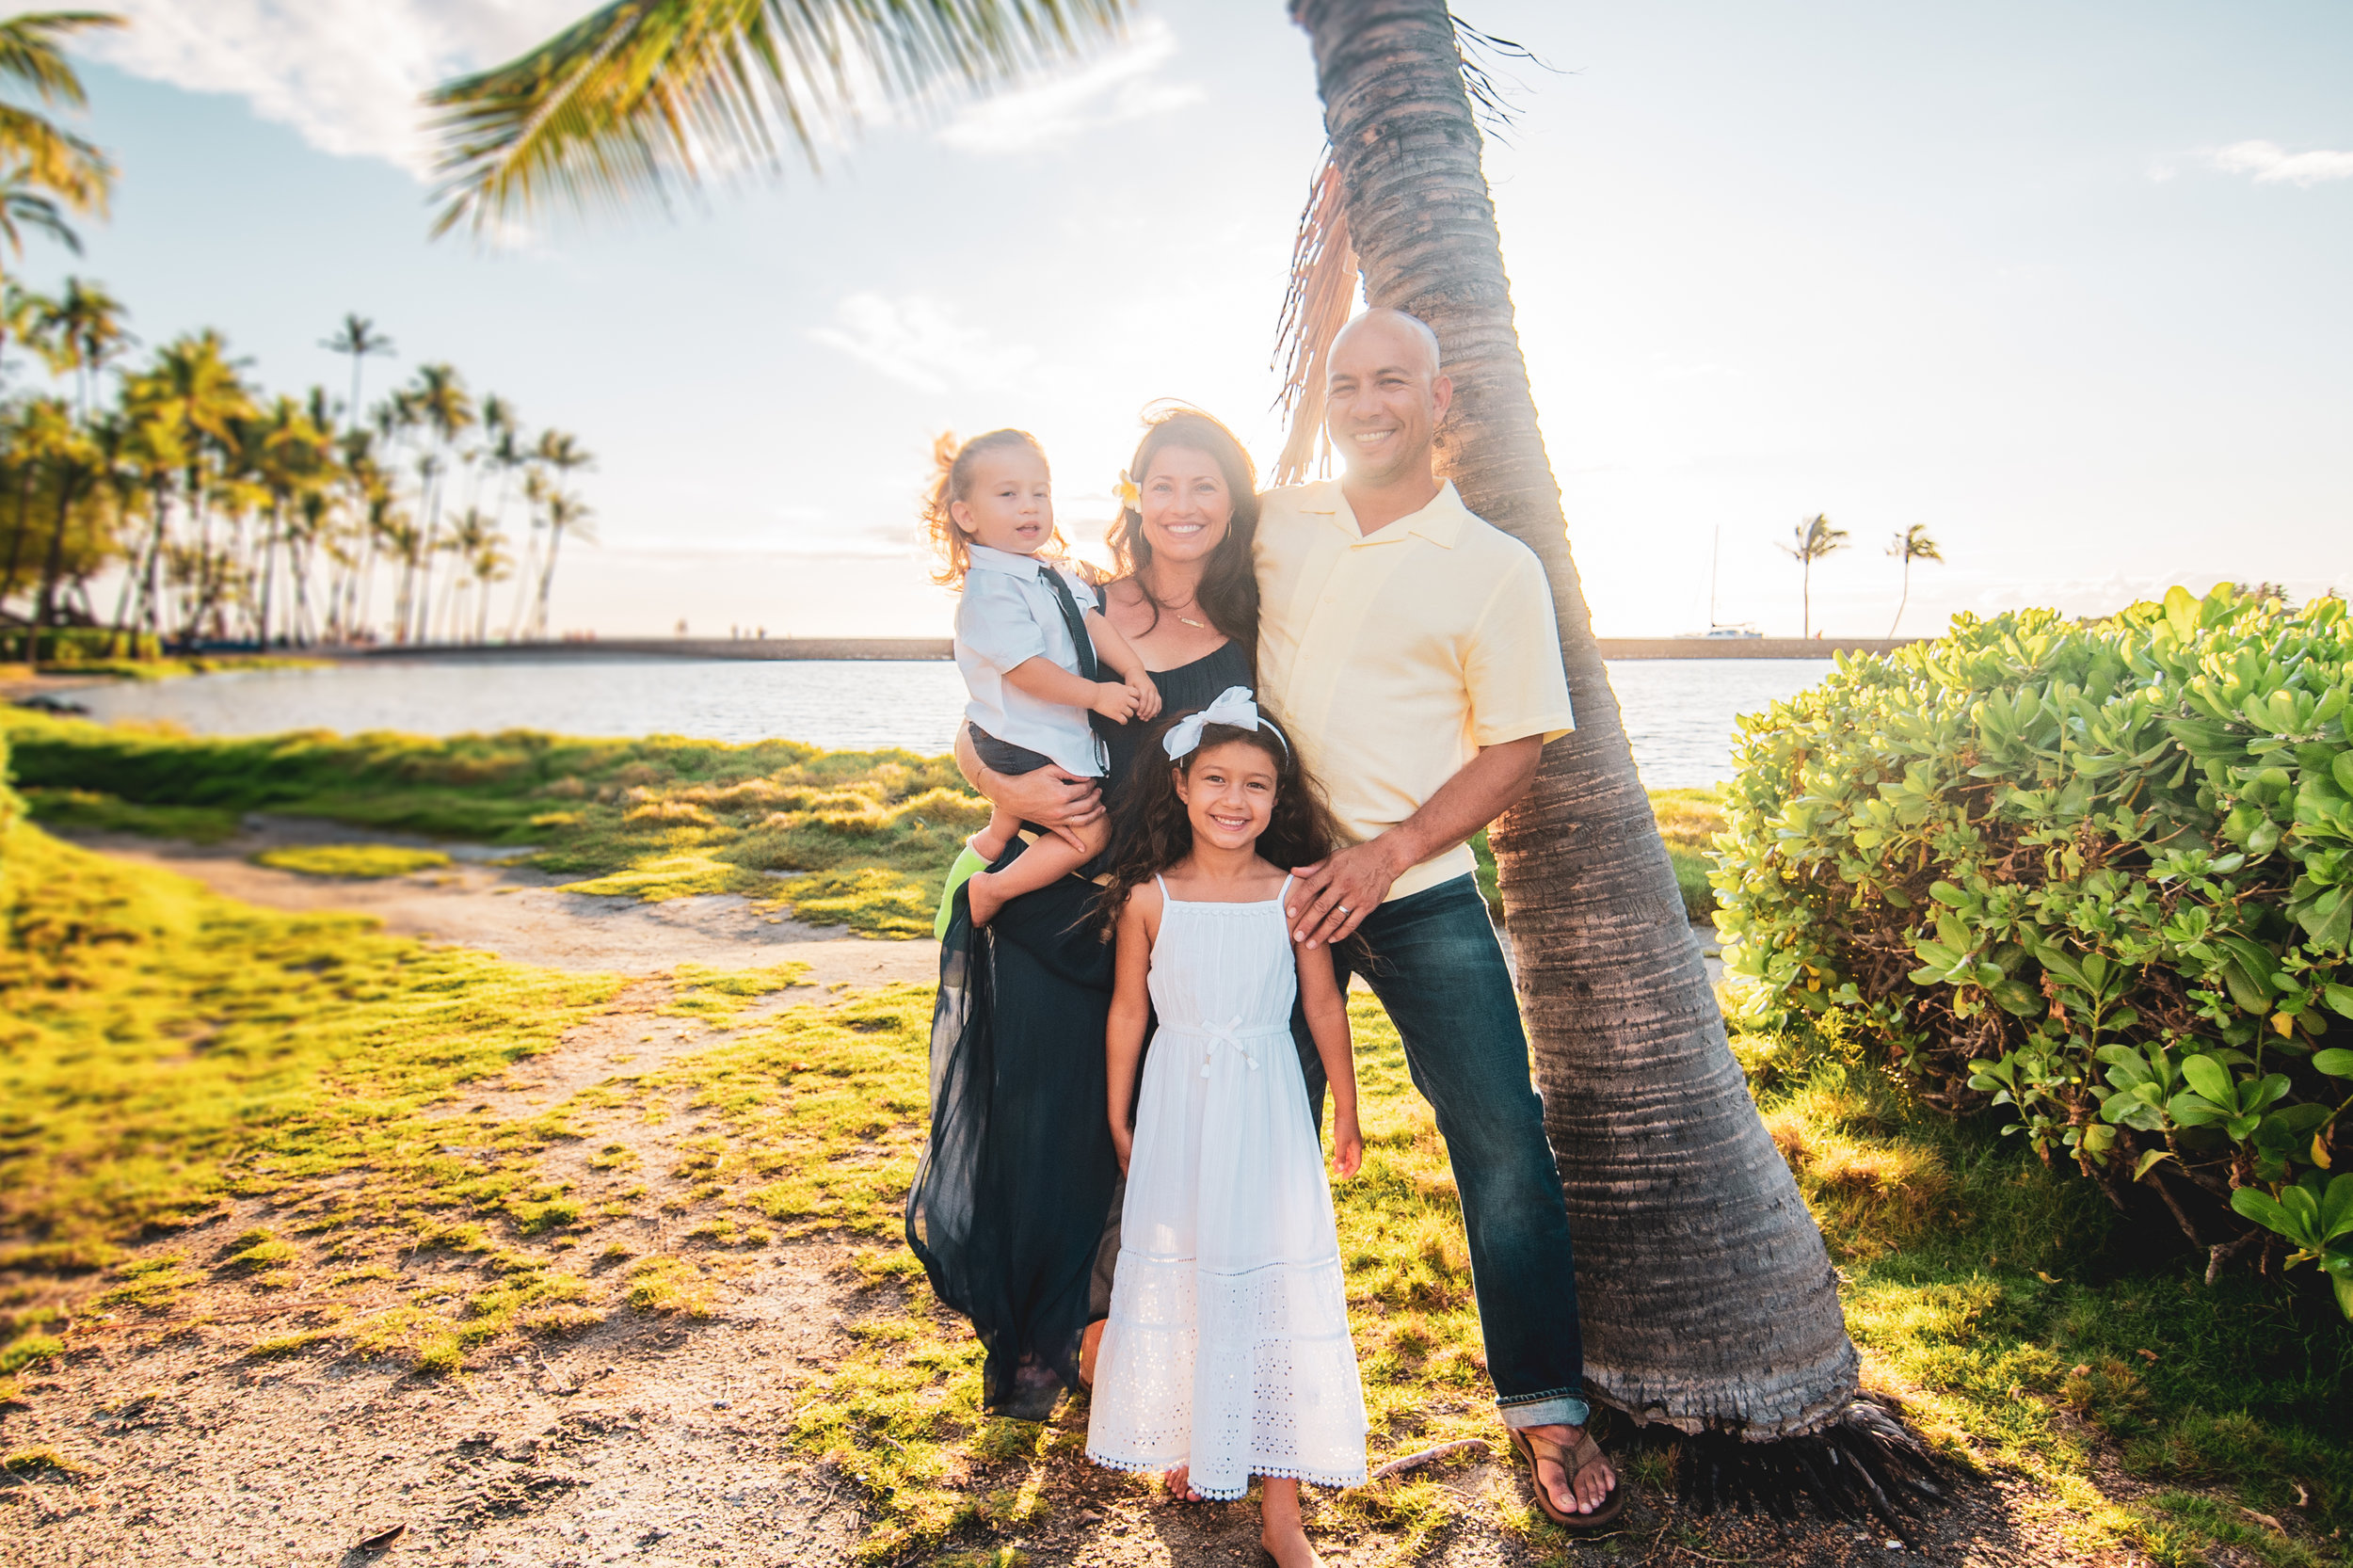 big island hawaii kona lifestyle beach family © kelilina photography 20190609183112.jpg